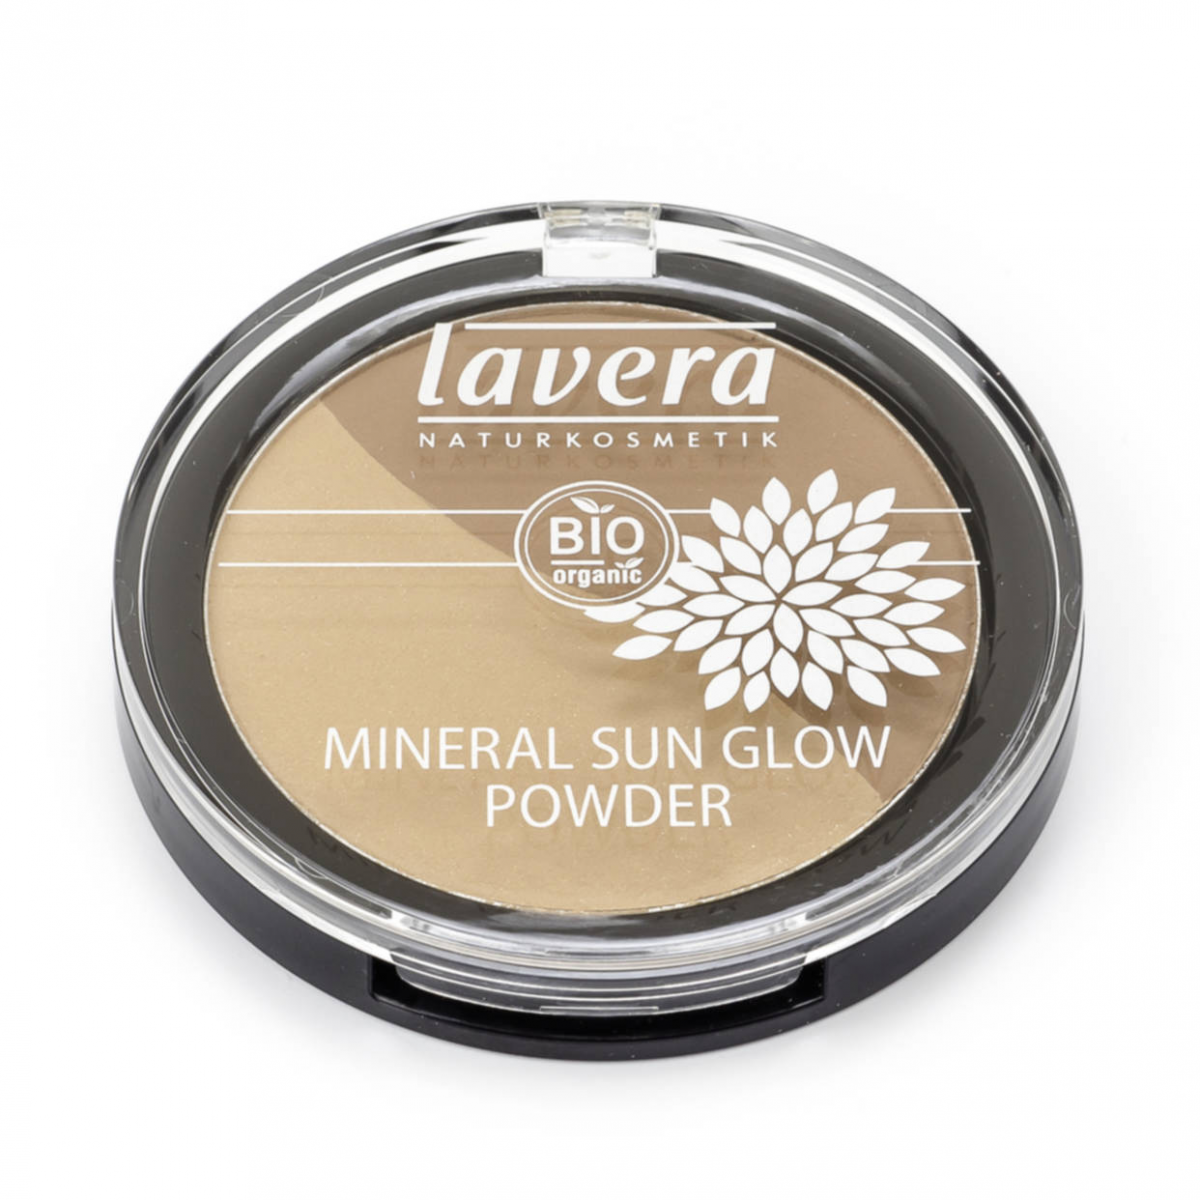 Mineral Sun Glow Powder Duo -Golden Sahara 01- Dose 9 g - Lavera